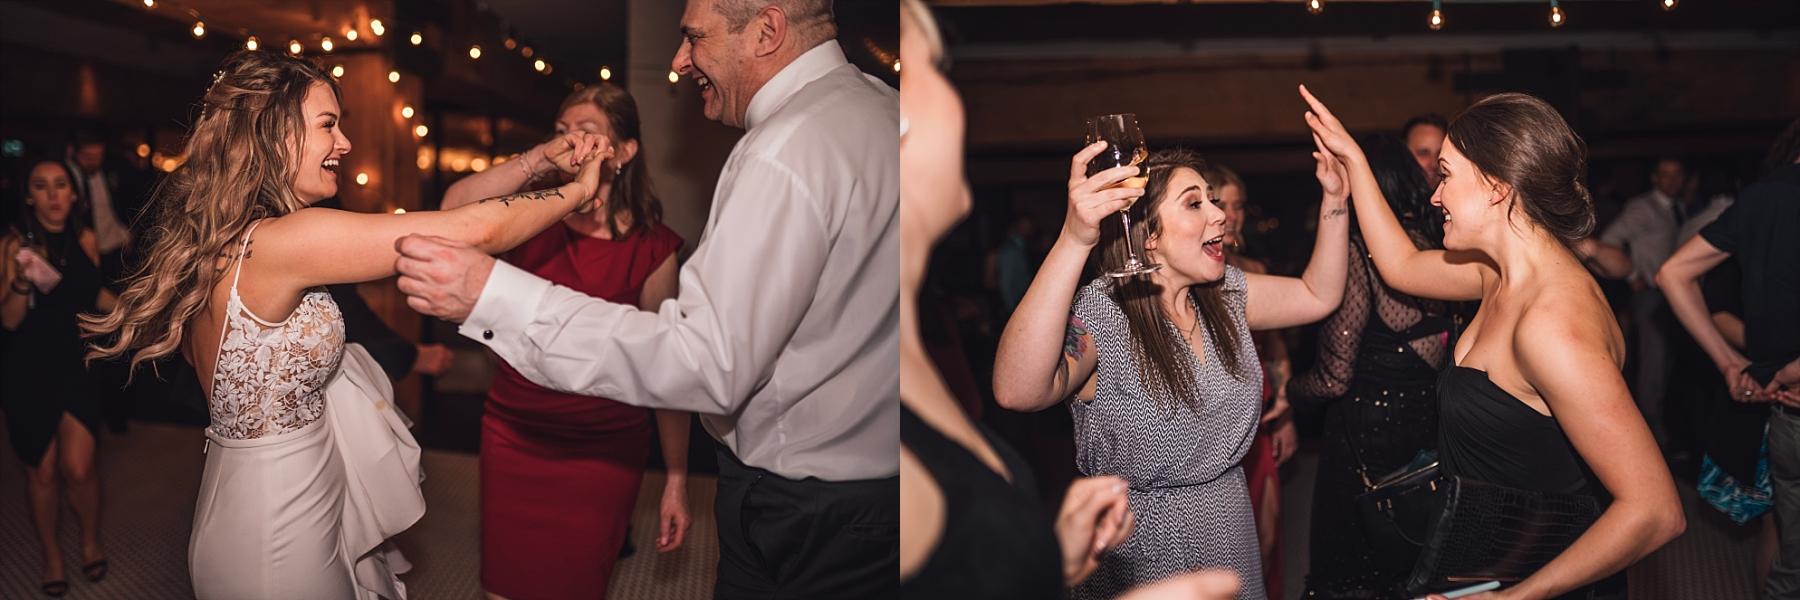 yaletown vancouver wedding photographer